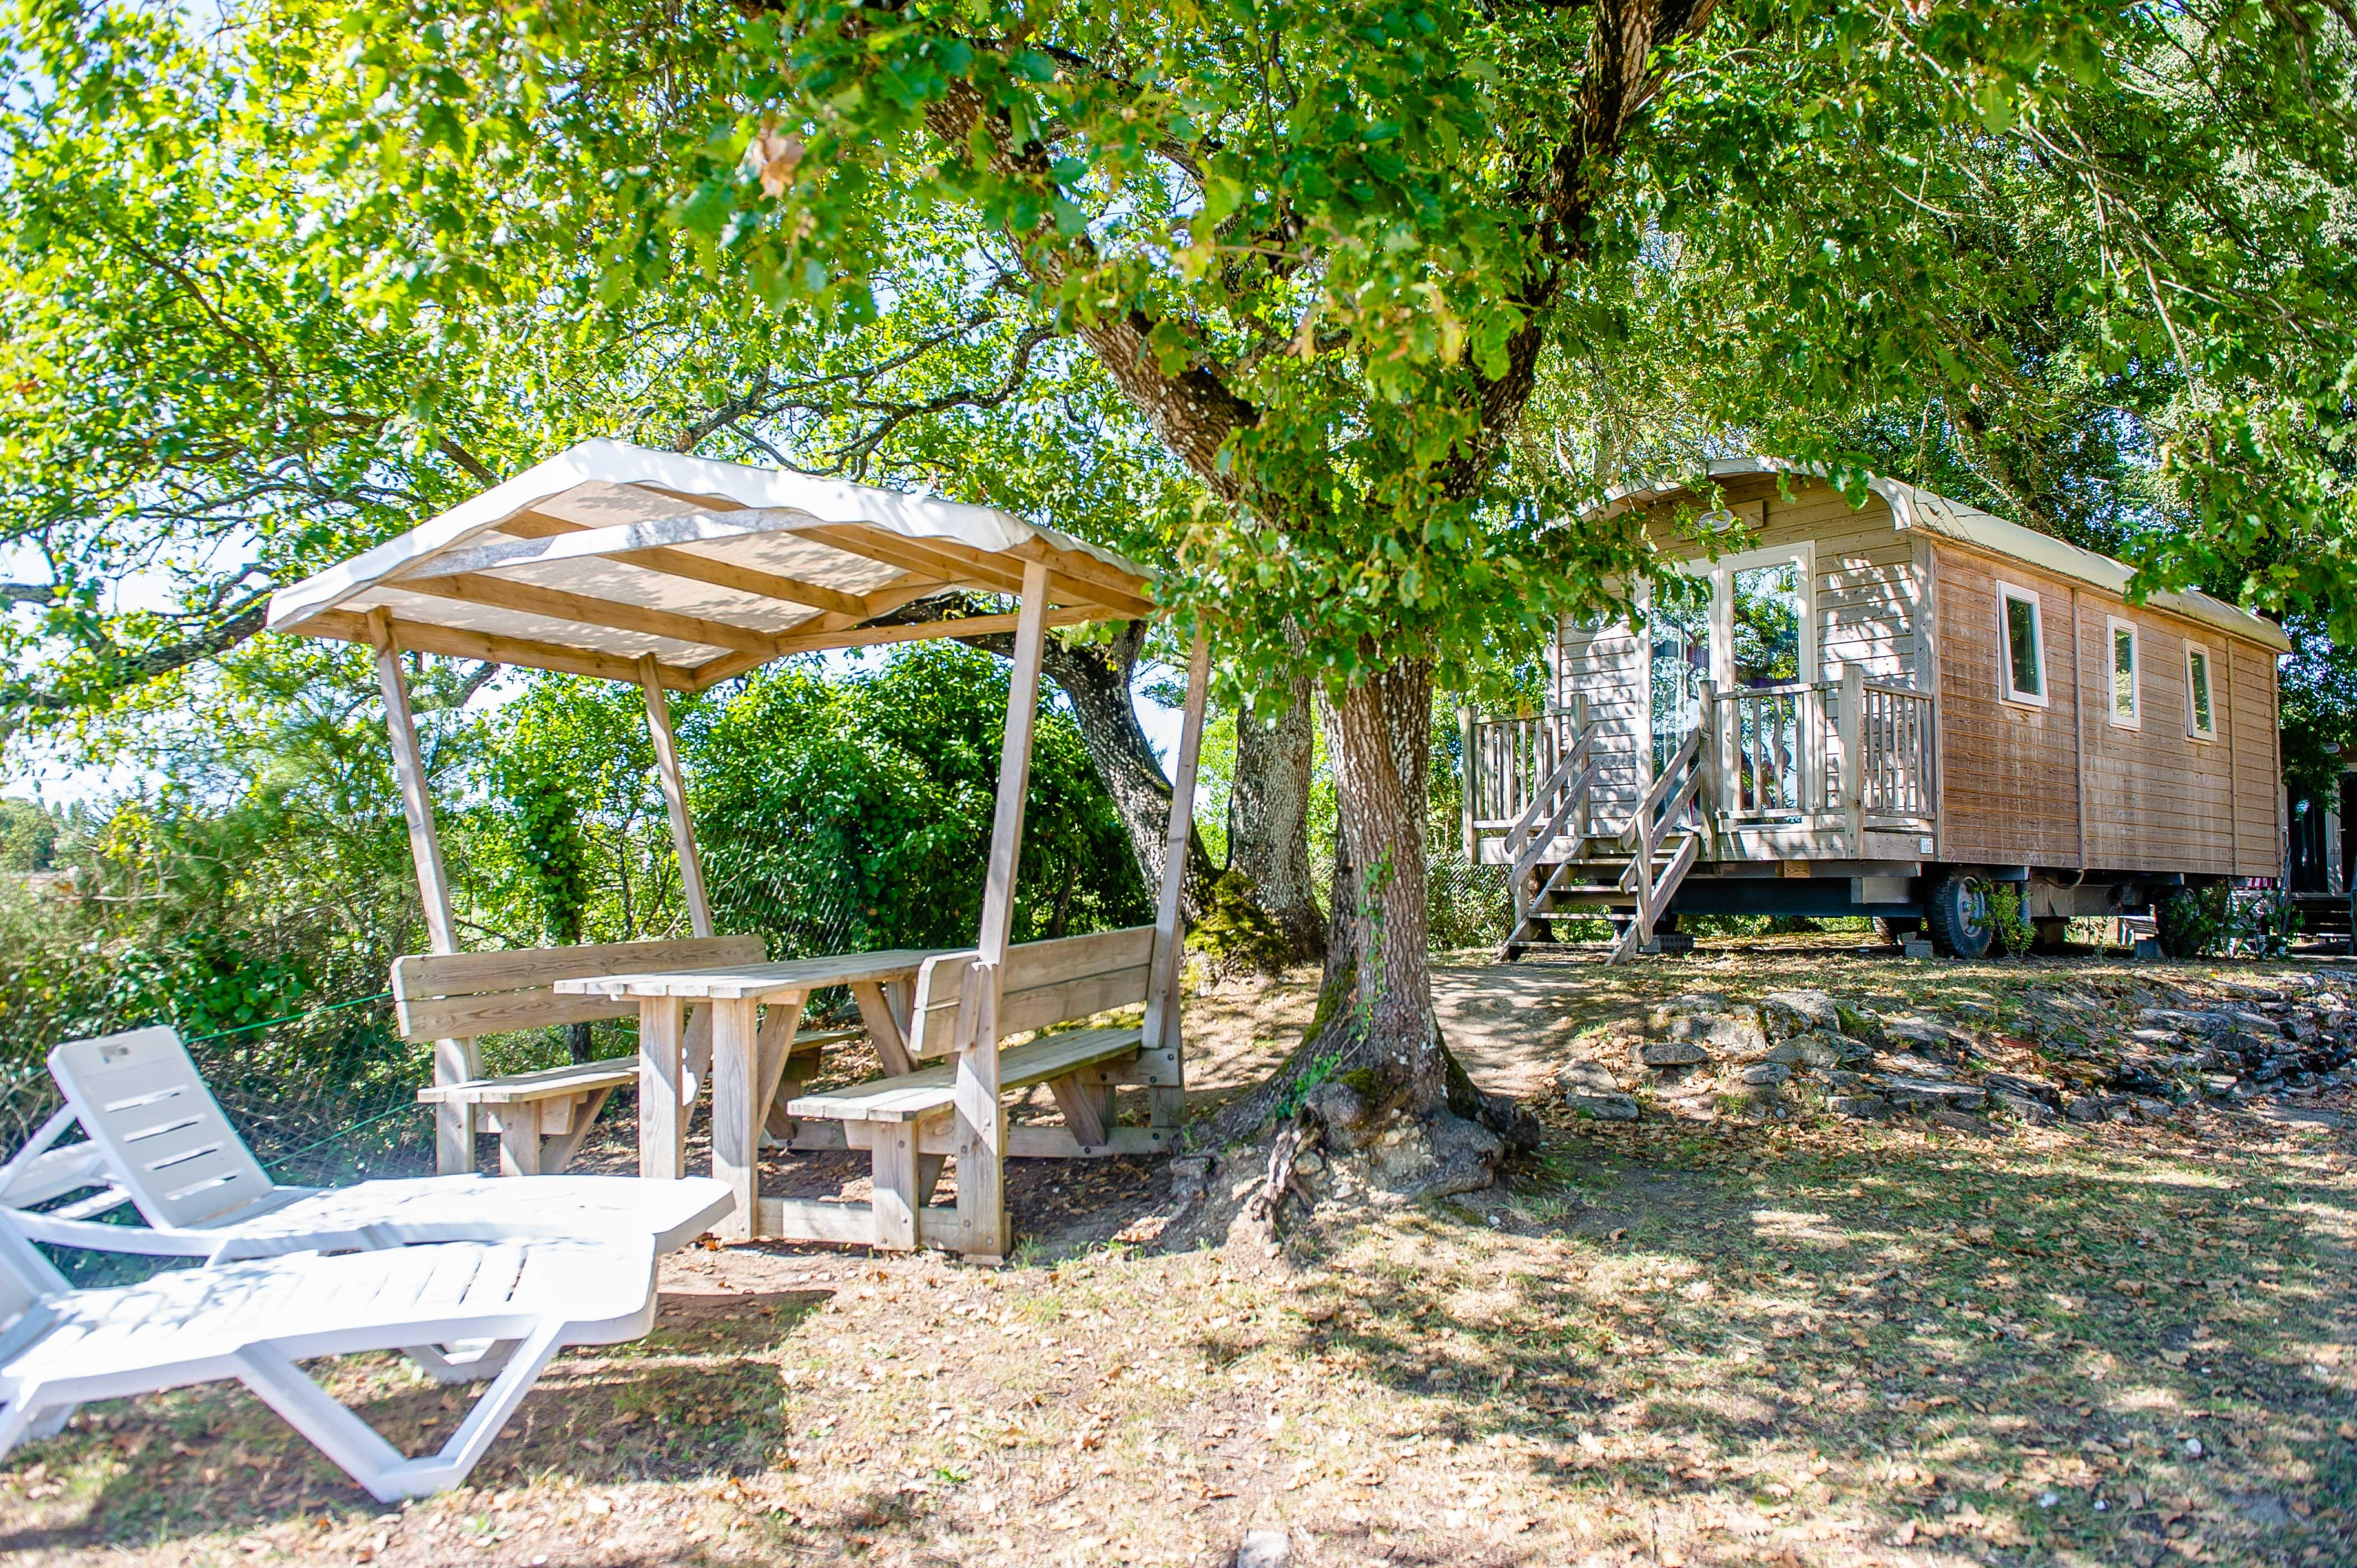 Camping Airotel Oléron, Le Château-d'Oléron, Charente-Maritime